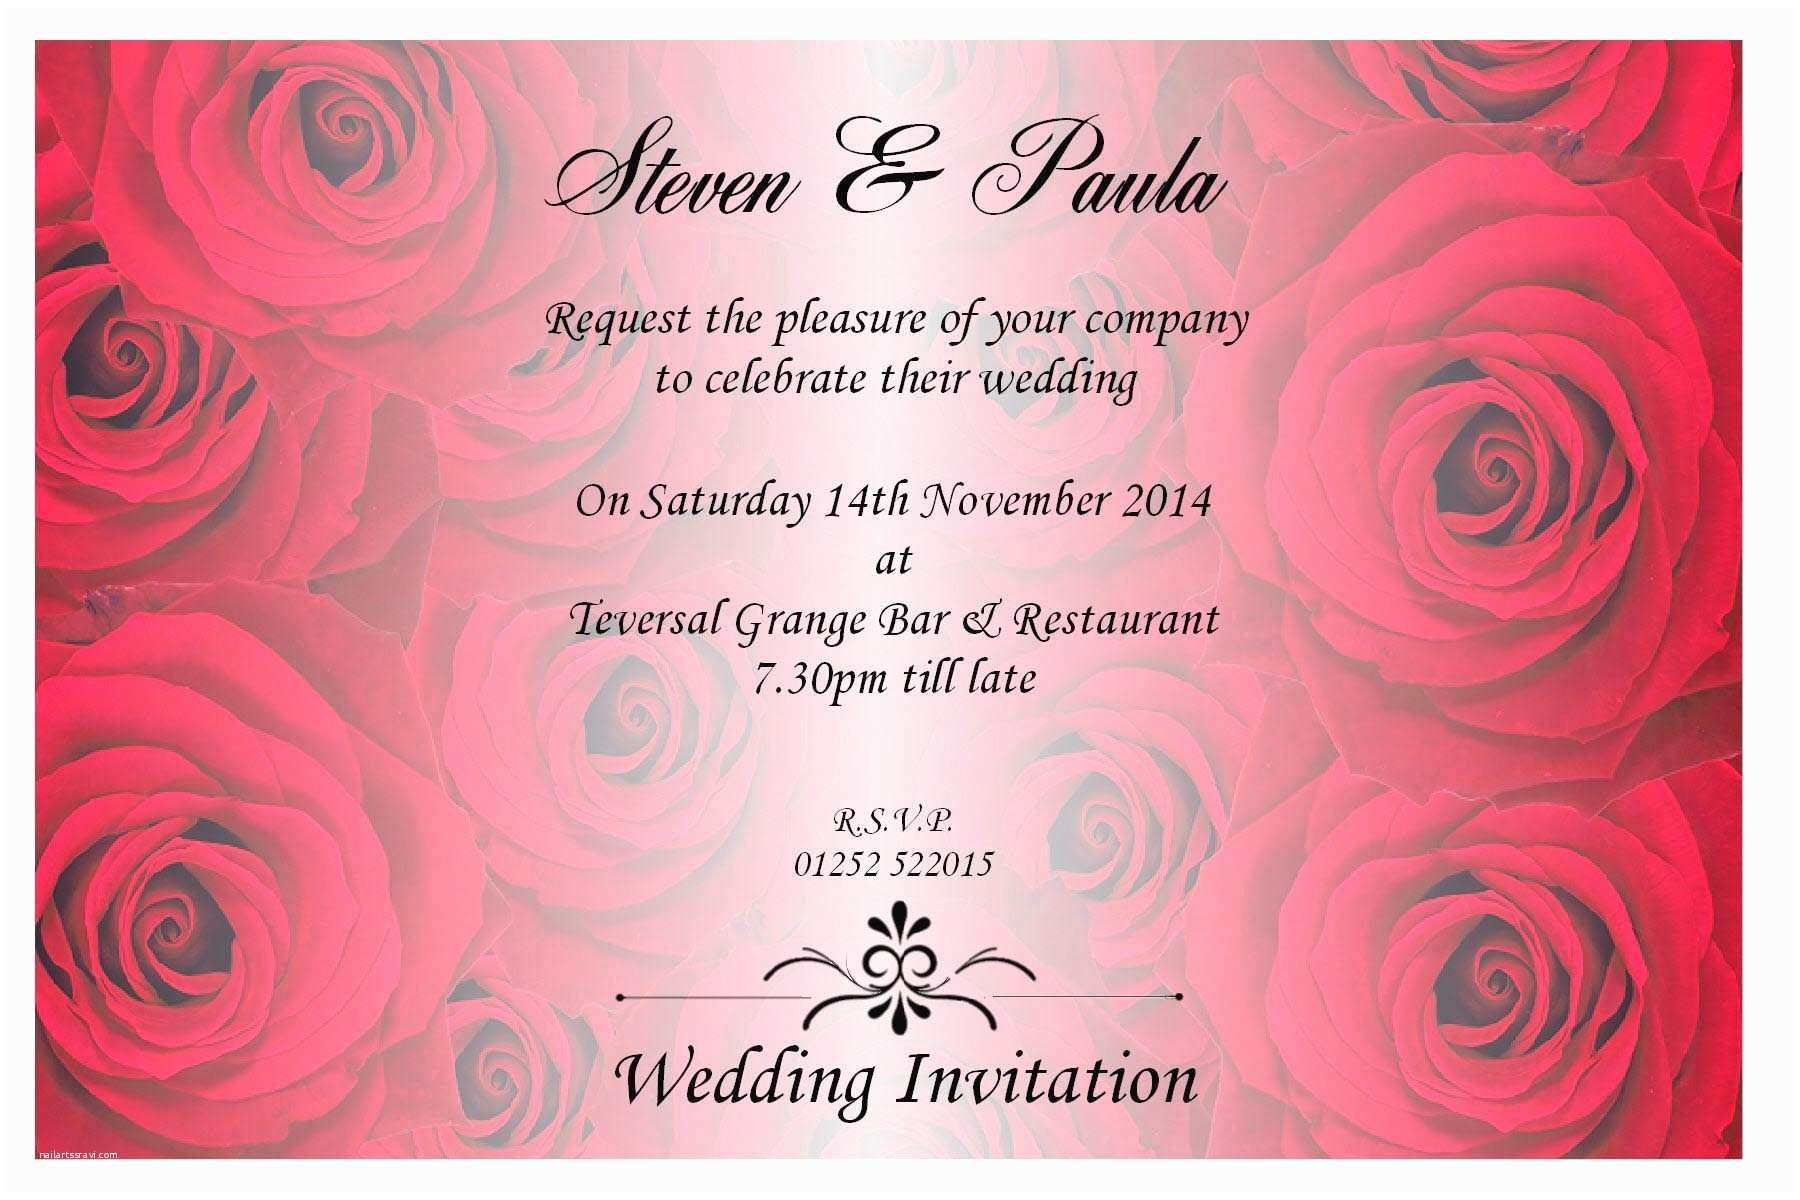 Wedding Invitation Phrases Romantic Marriage Invitation Quotes for Indian Wedding